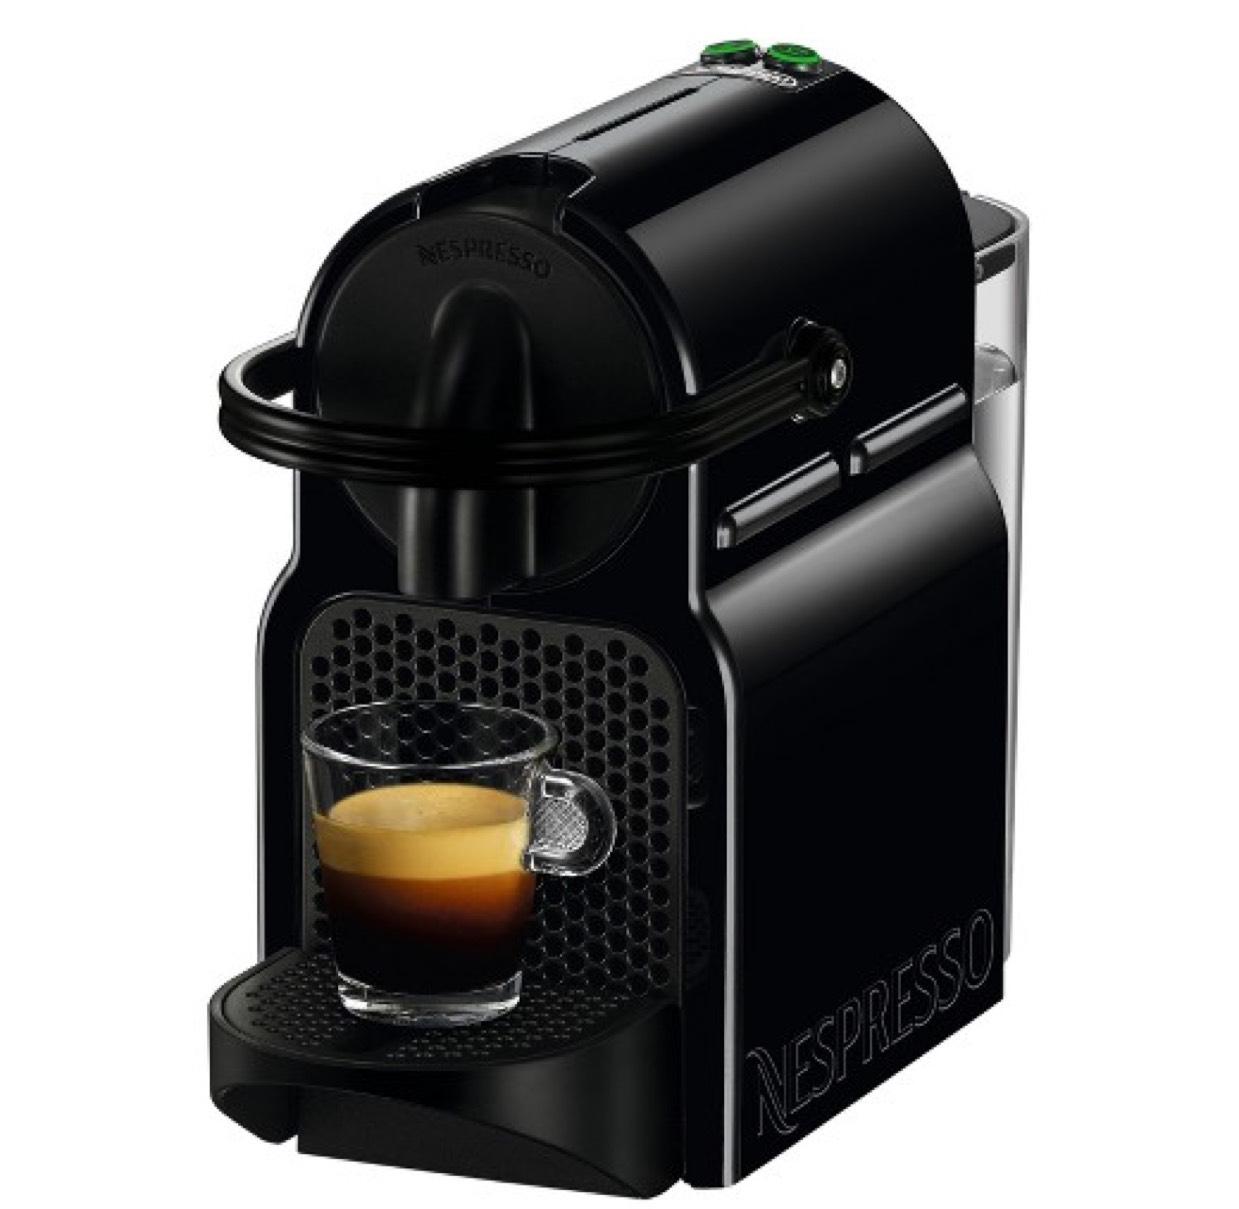 Nespresso Inissia Machine and Aeroccino with 150 capsules at Nespresso for £106.49 (£59.99 for Machine & Aeroccino) @ Nespresso